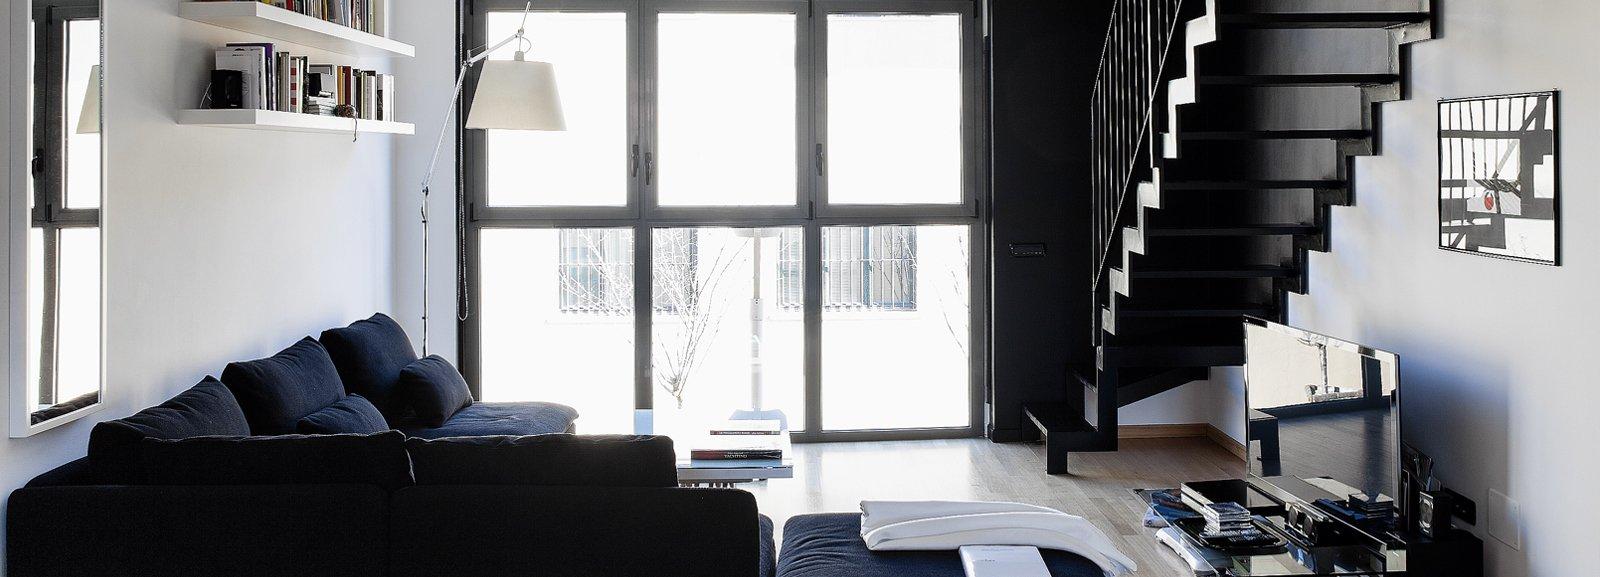 60 50 mq una casa con elementi a scomparsa cose di casa for Casa moderna di 50 mq